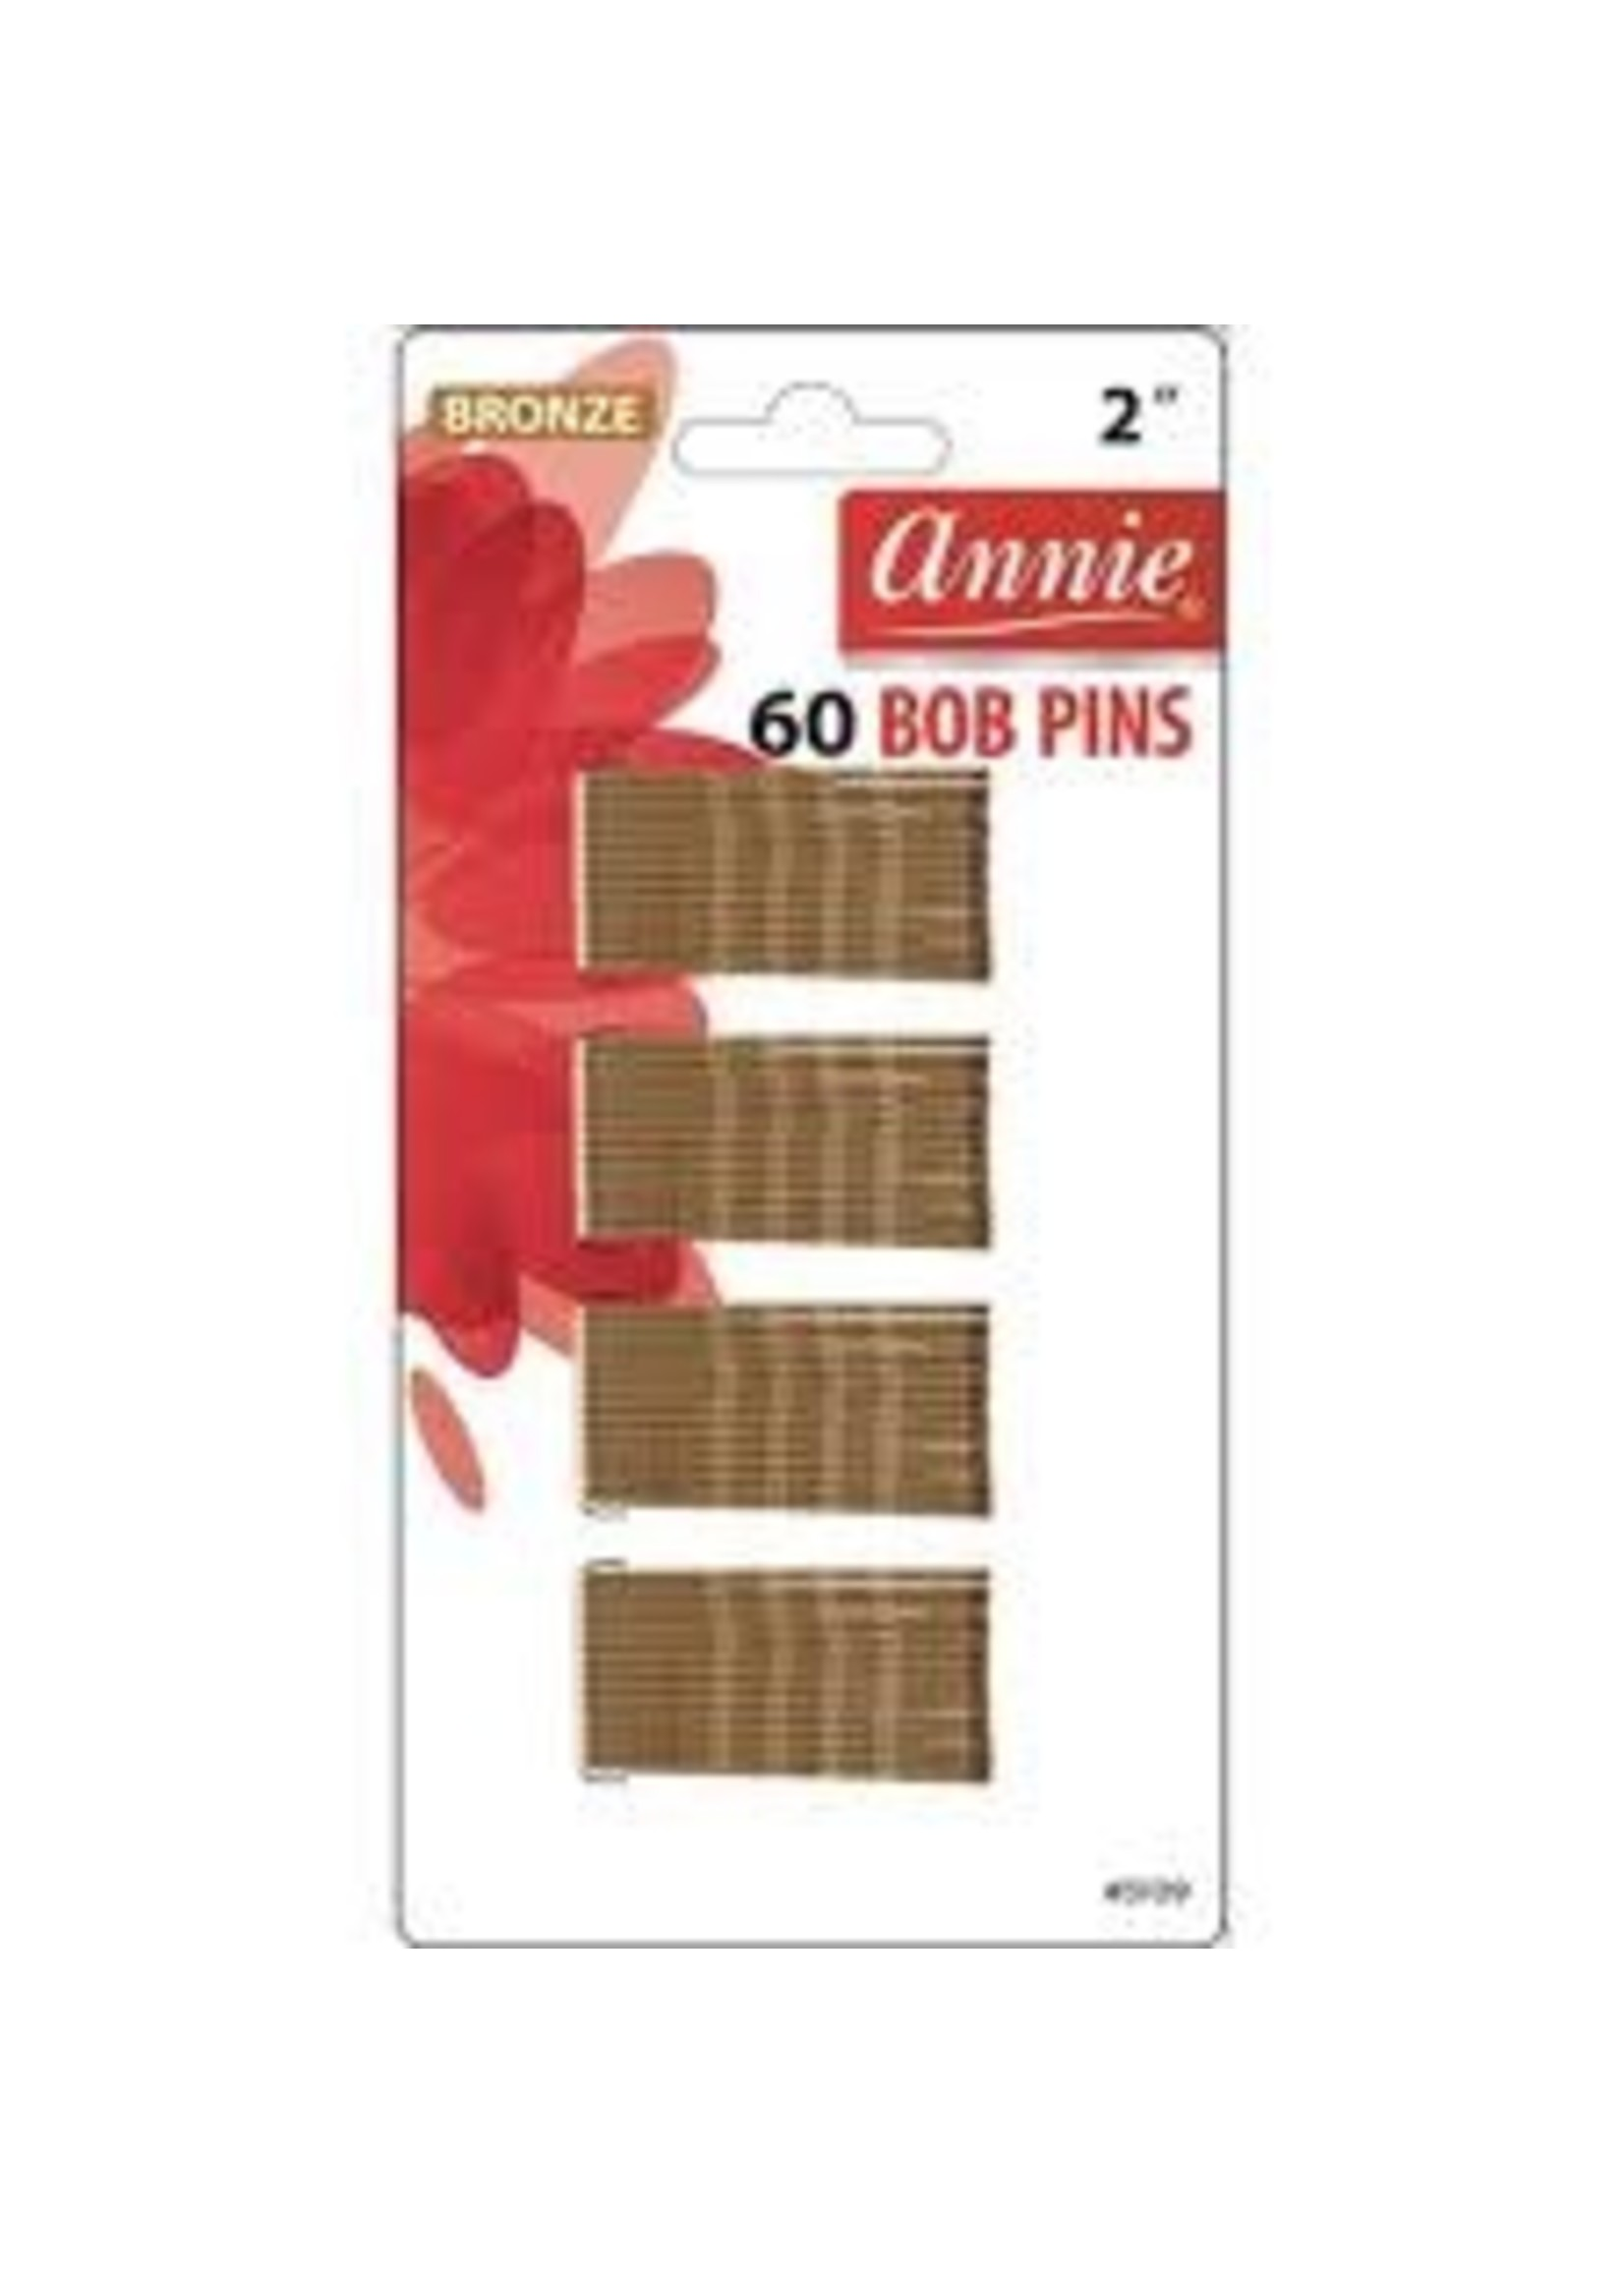 Annie bob pins bronze